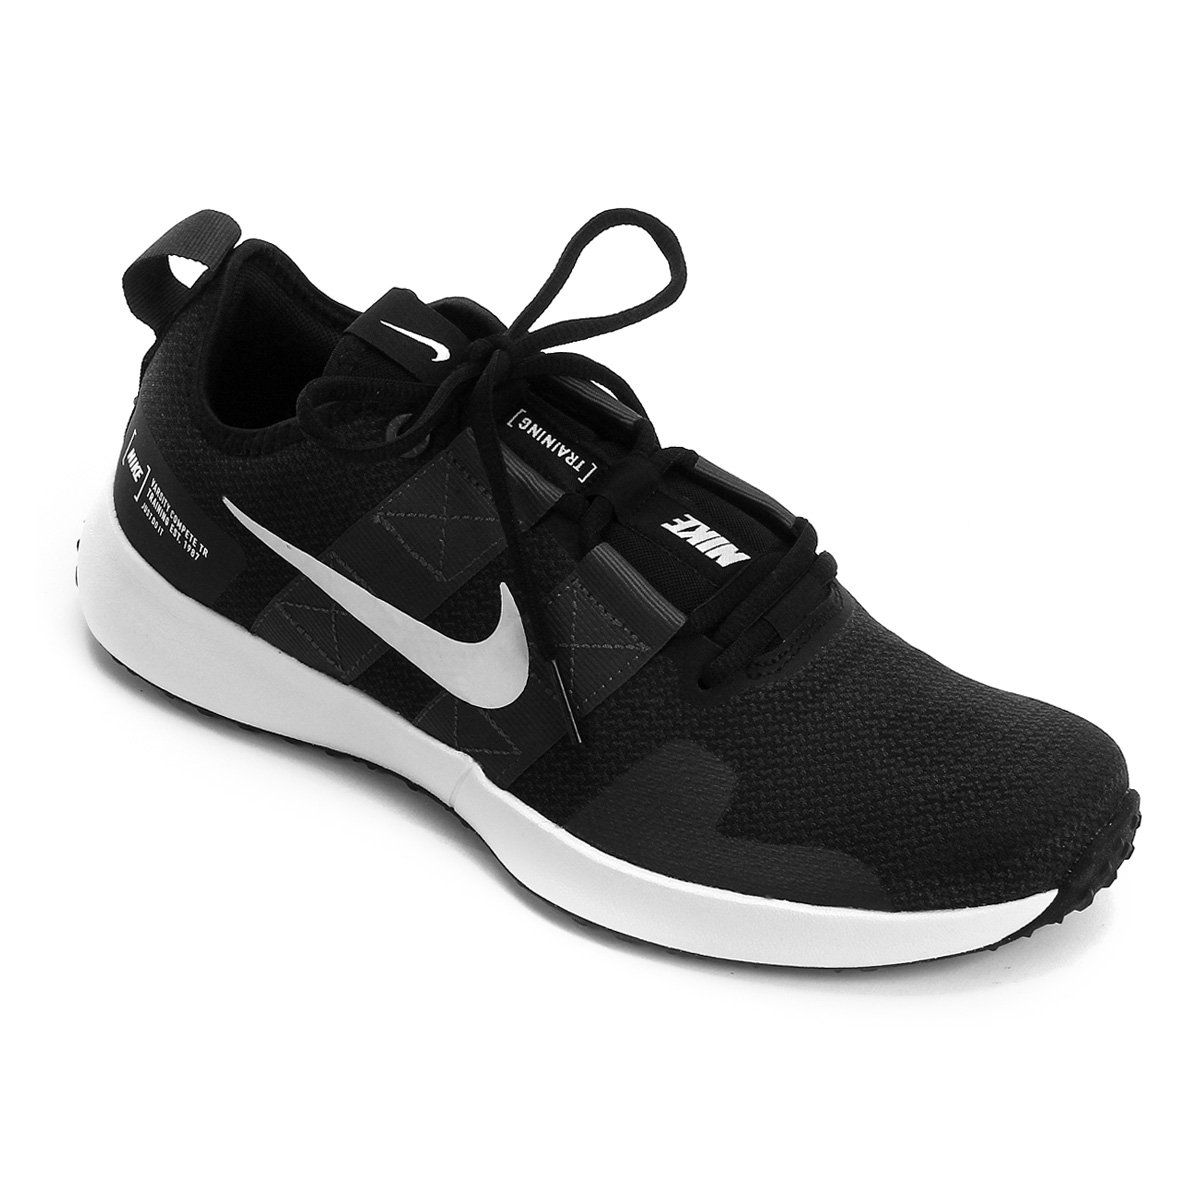 Tênis Nike Varsity Compete Tr 2 Masculino